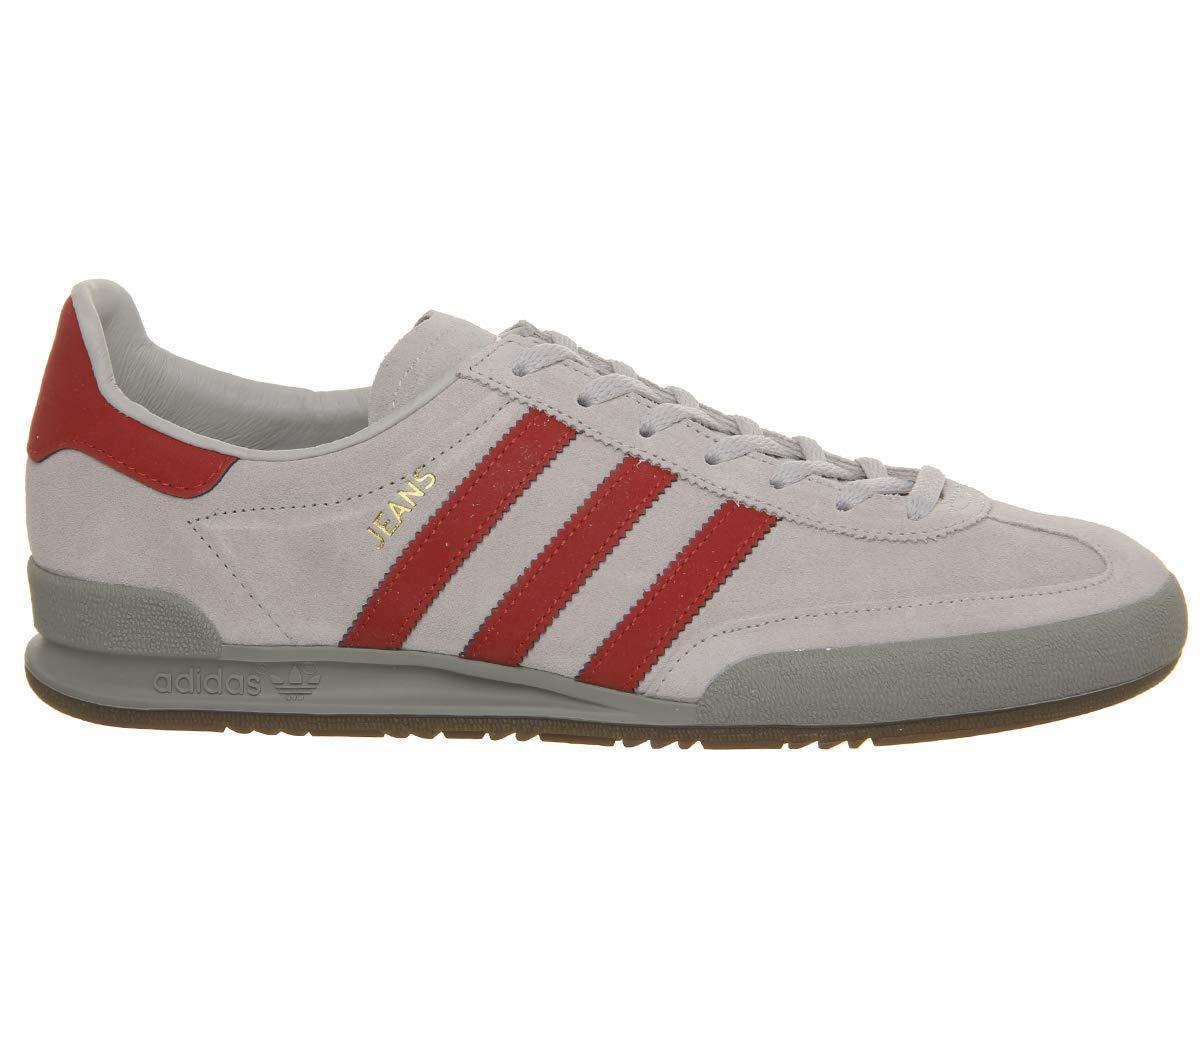 Adidas Originals Jeans Turnschuhe Herren hellgrau rot, 9.5 UK - 44 EU - 10 US